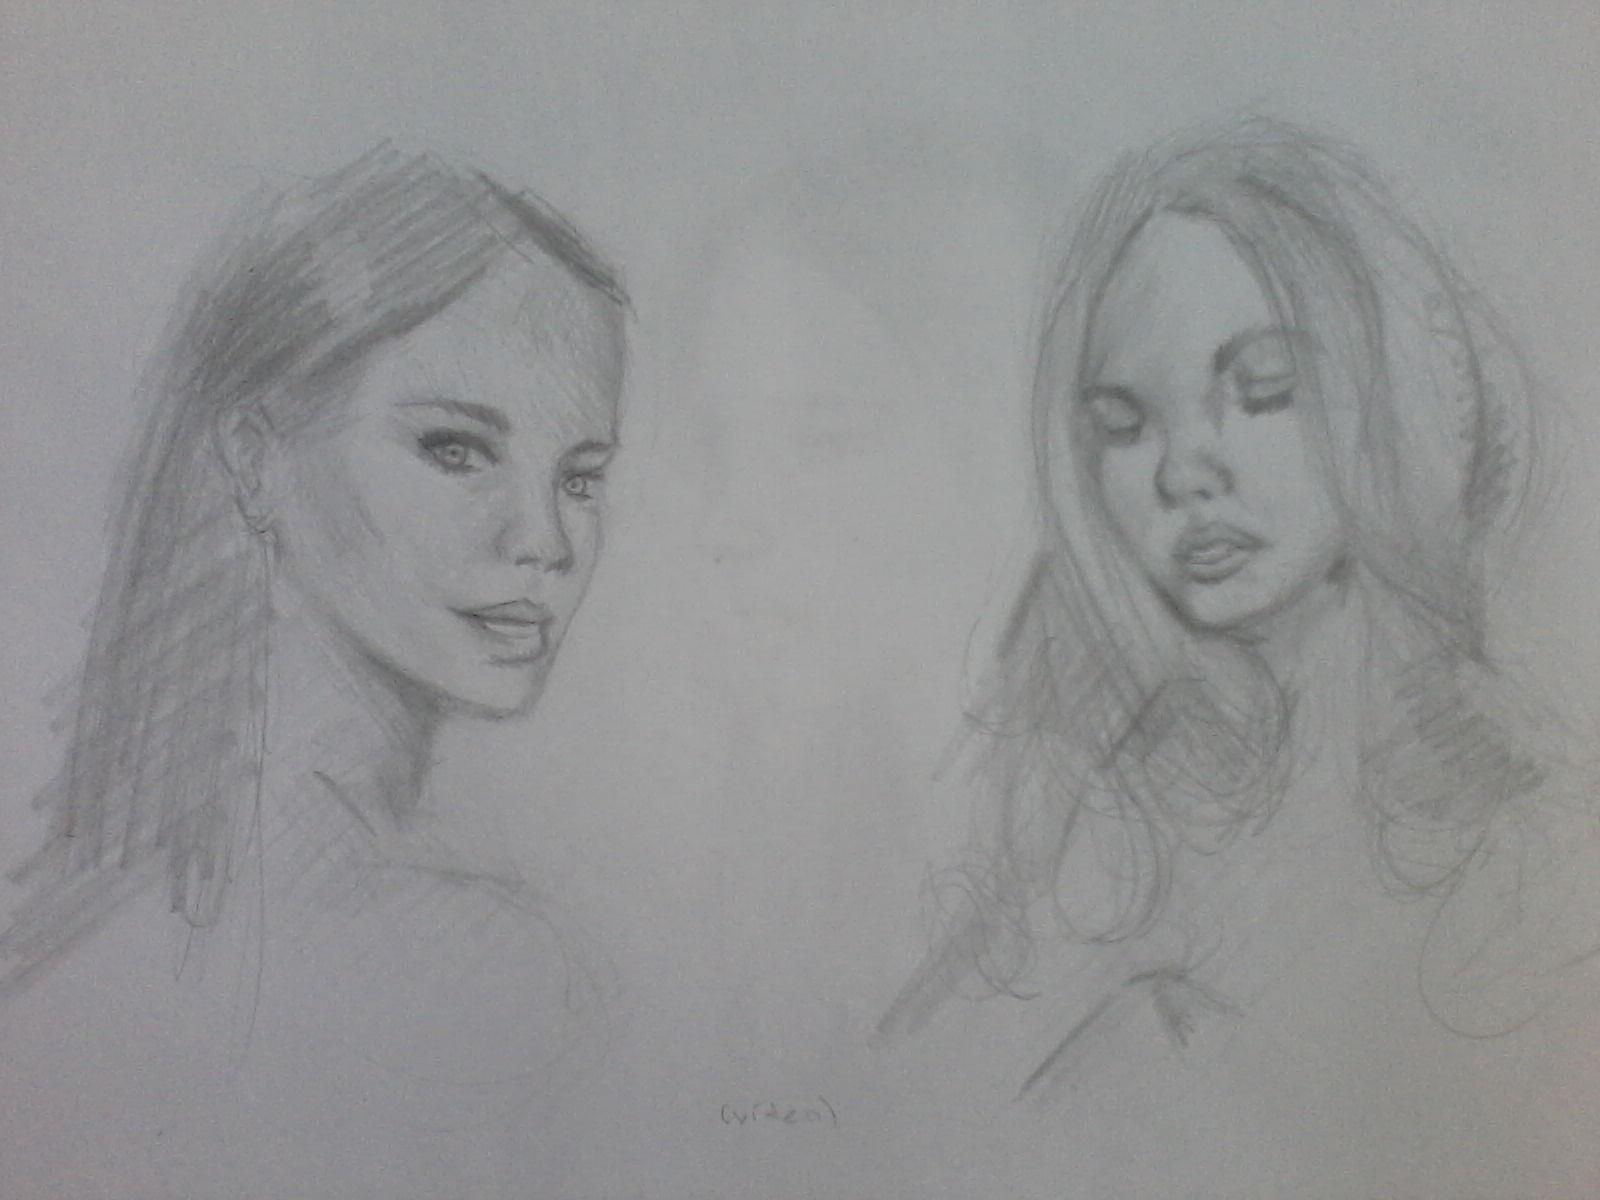 Face Study 2